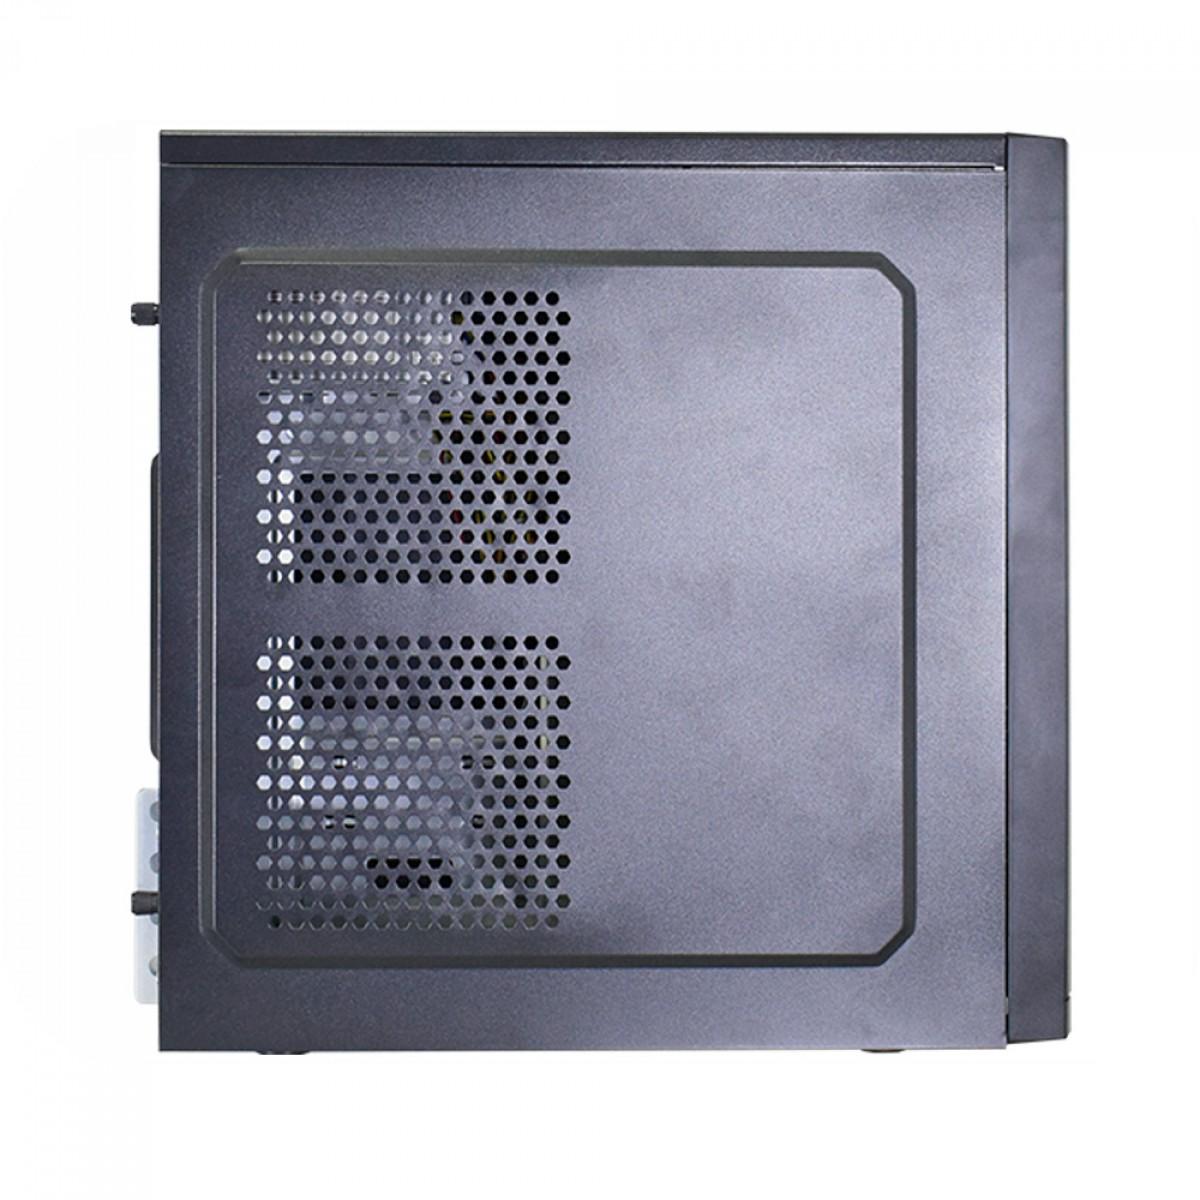 Computador T-home NTC Price 4142 Intel Core i3 9100 / 4GB / SSD 240GB